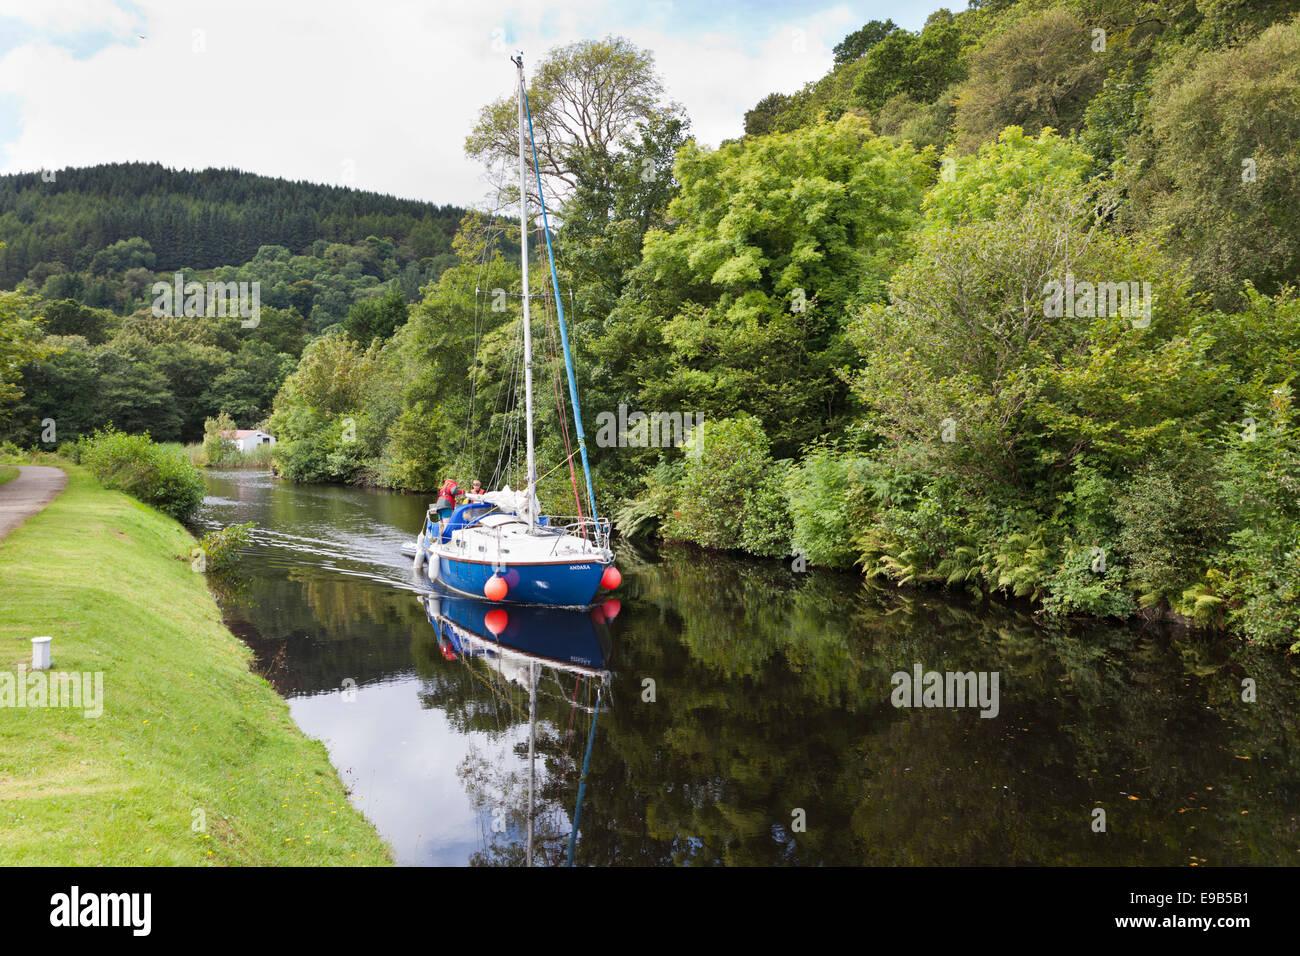 The Crinan Canal - A yacht approaching Crinan Swing Bridge, Crinan, Knapdale, Argyll & Bute, Scotland UK Stock Photo